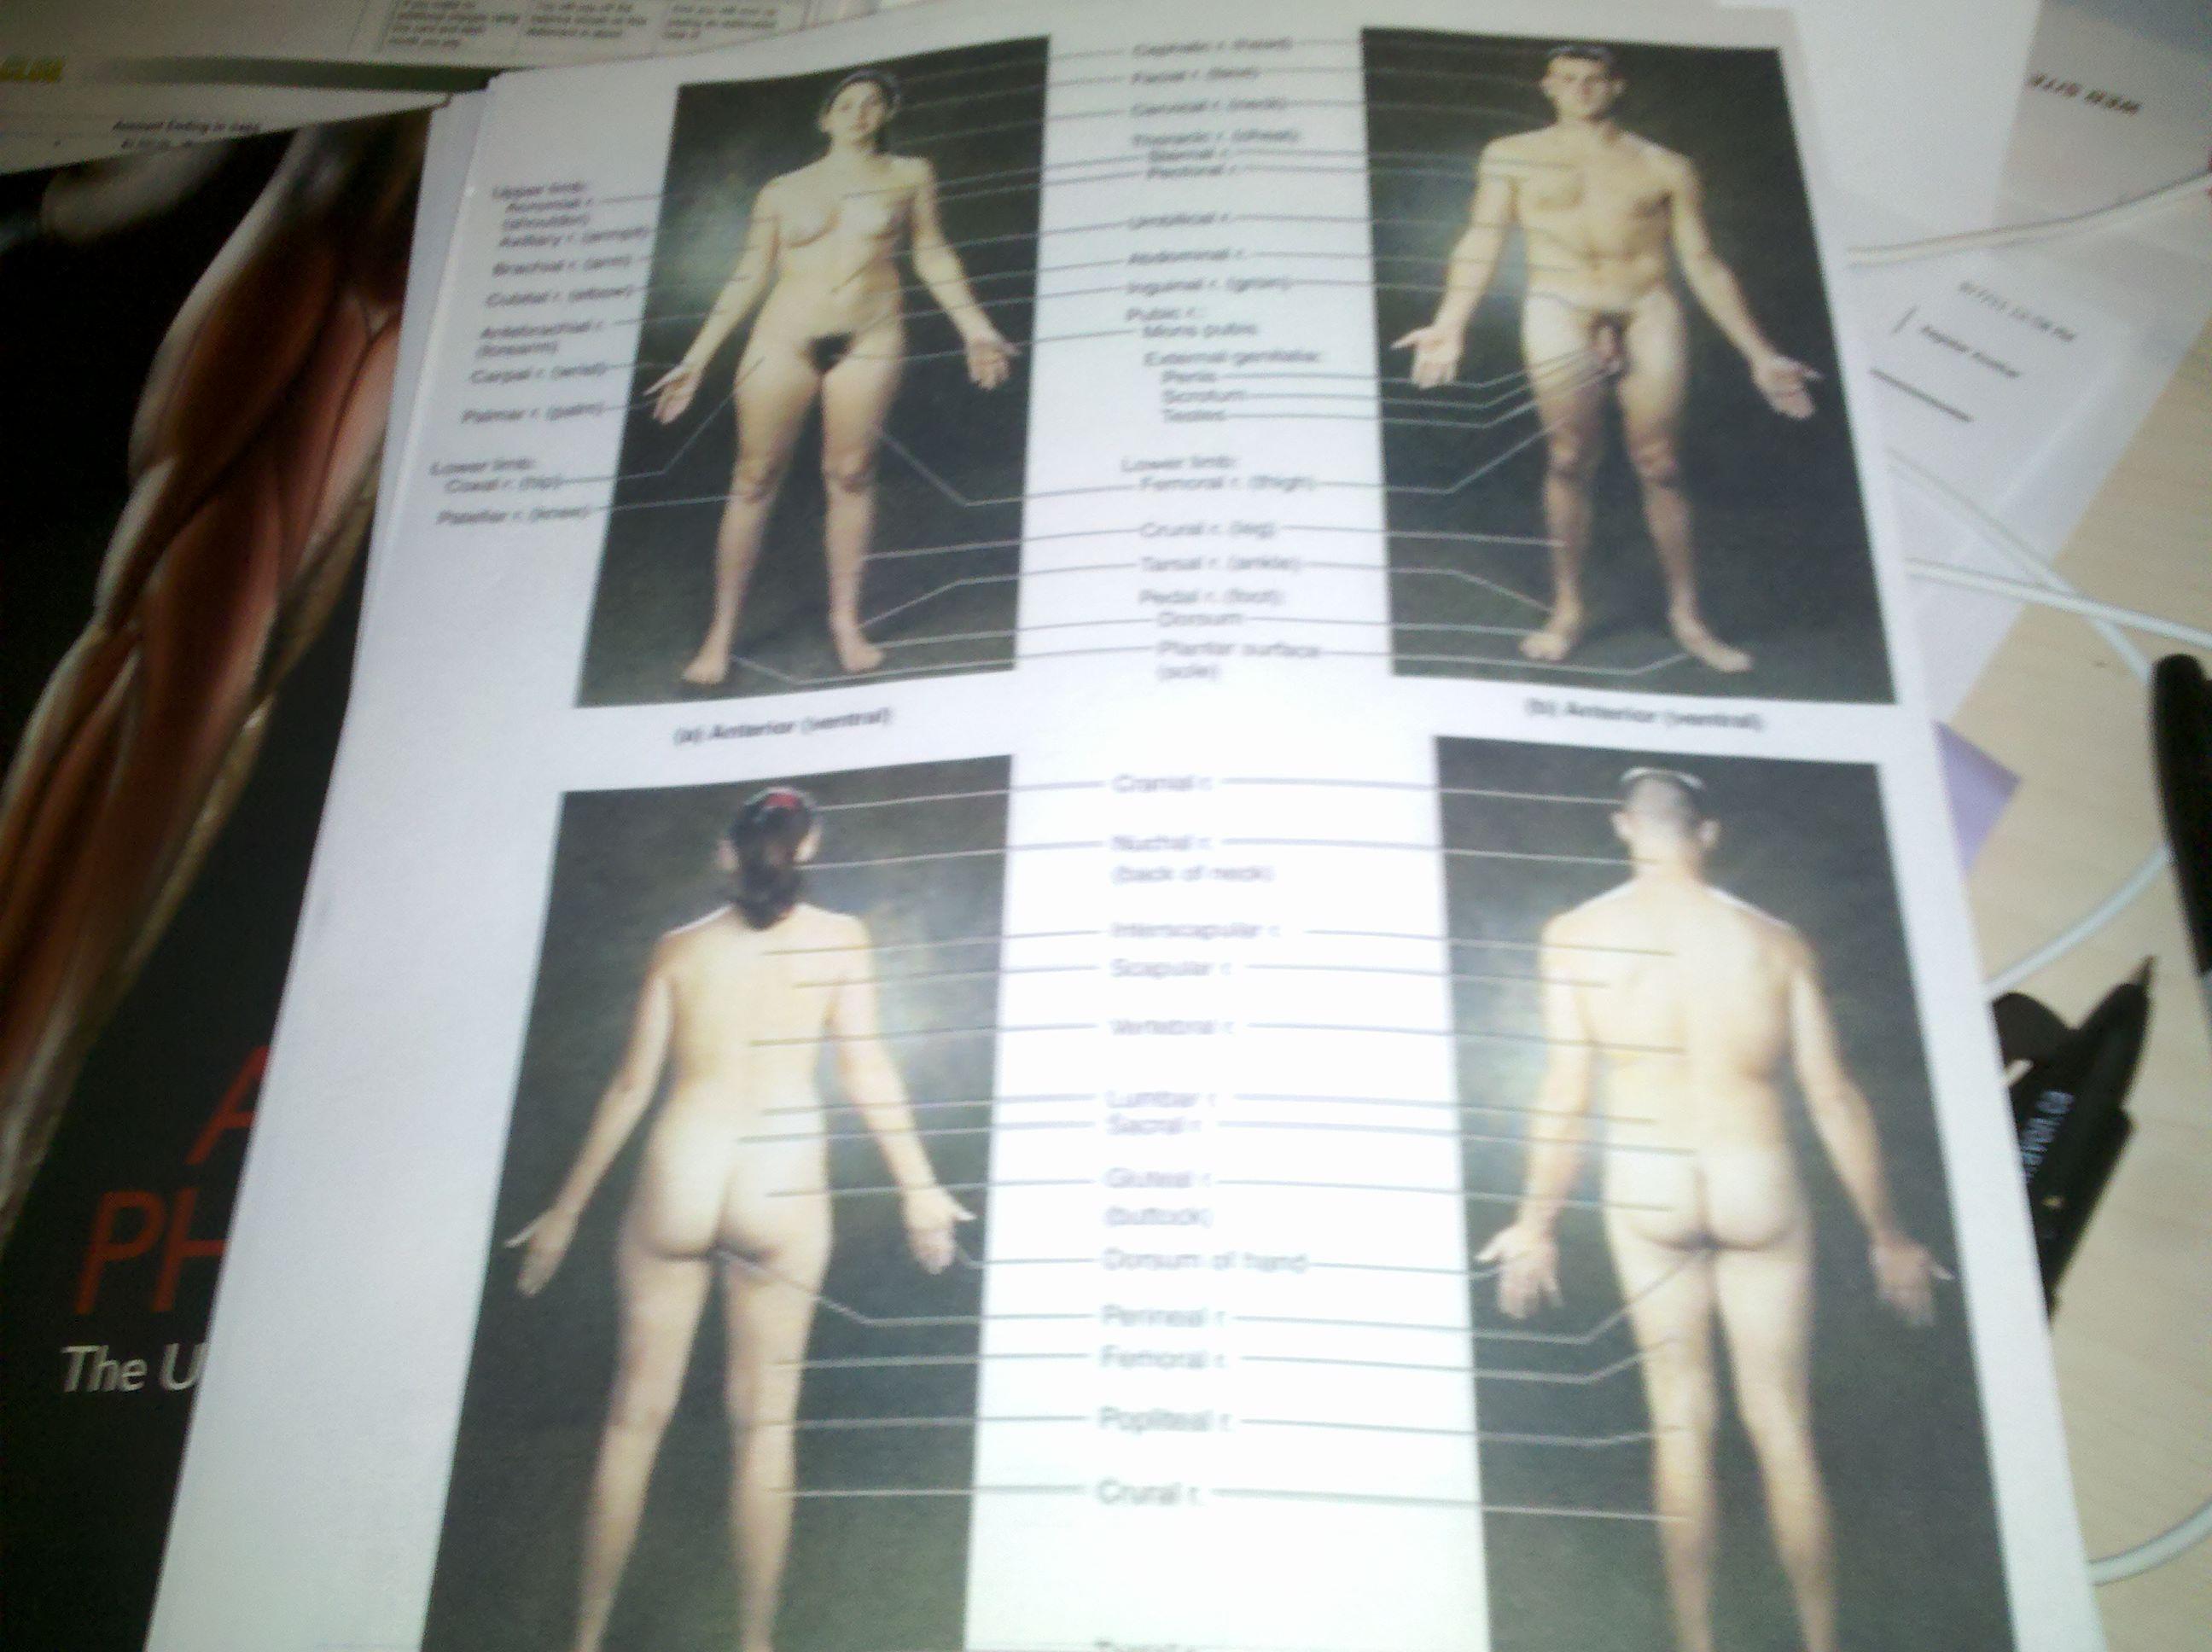 P90x nude women